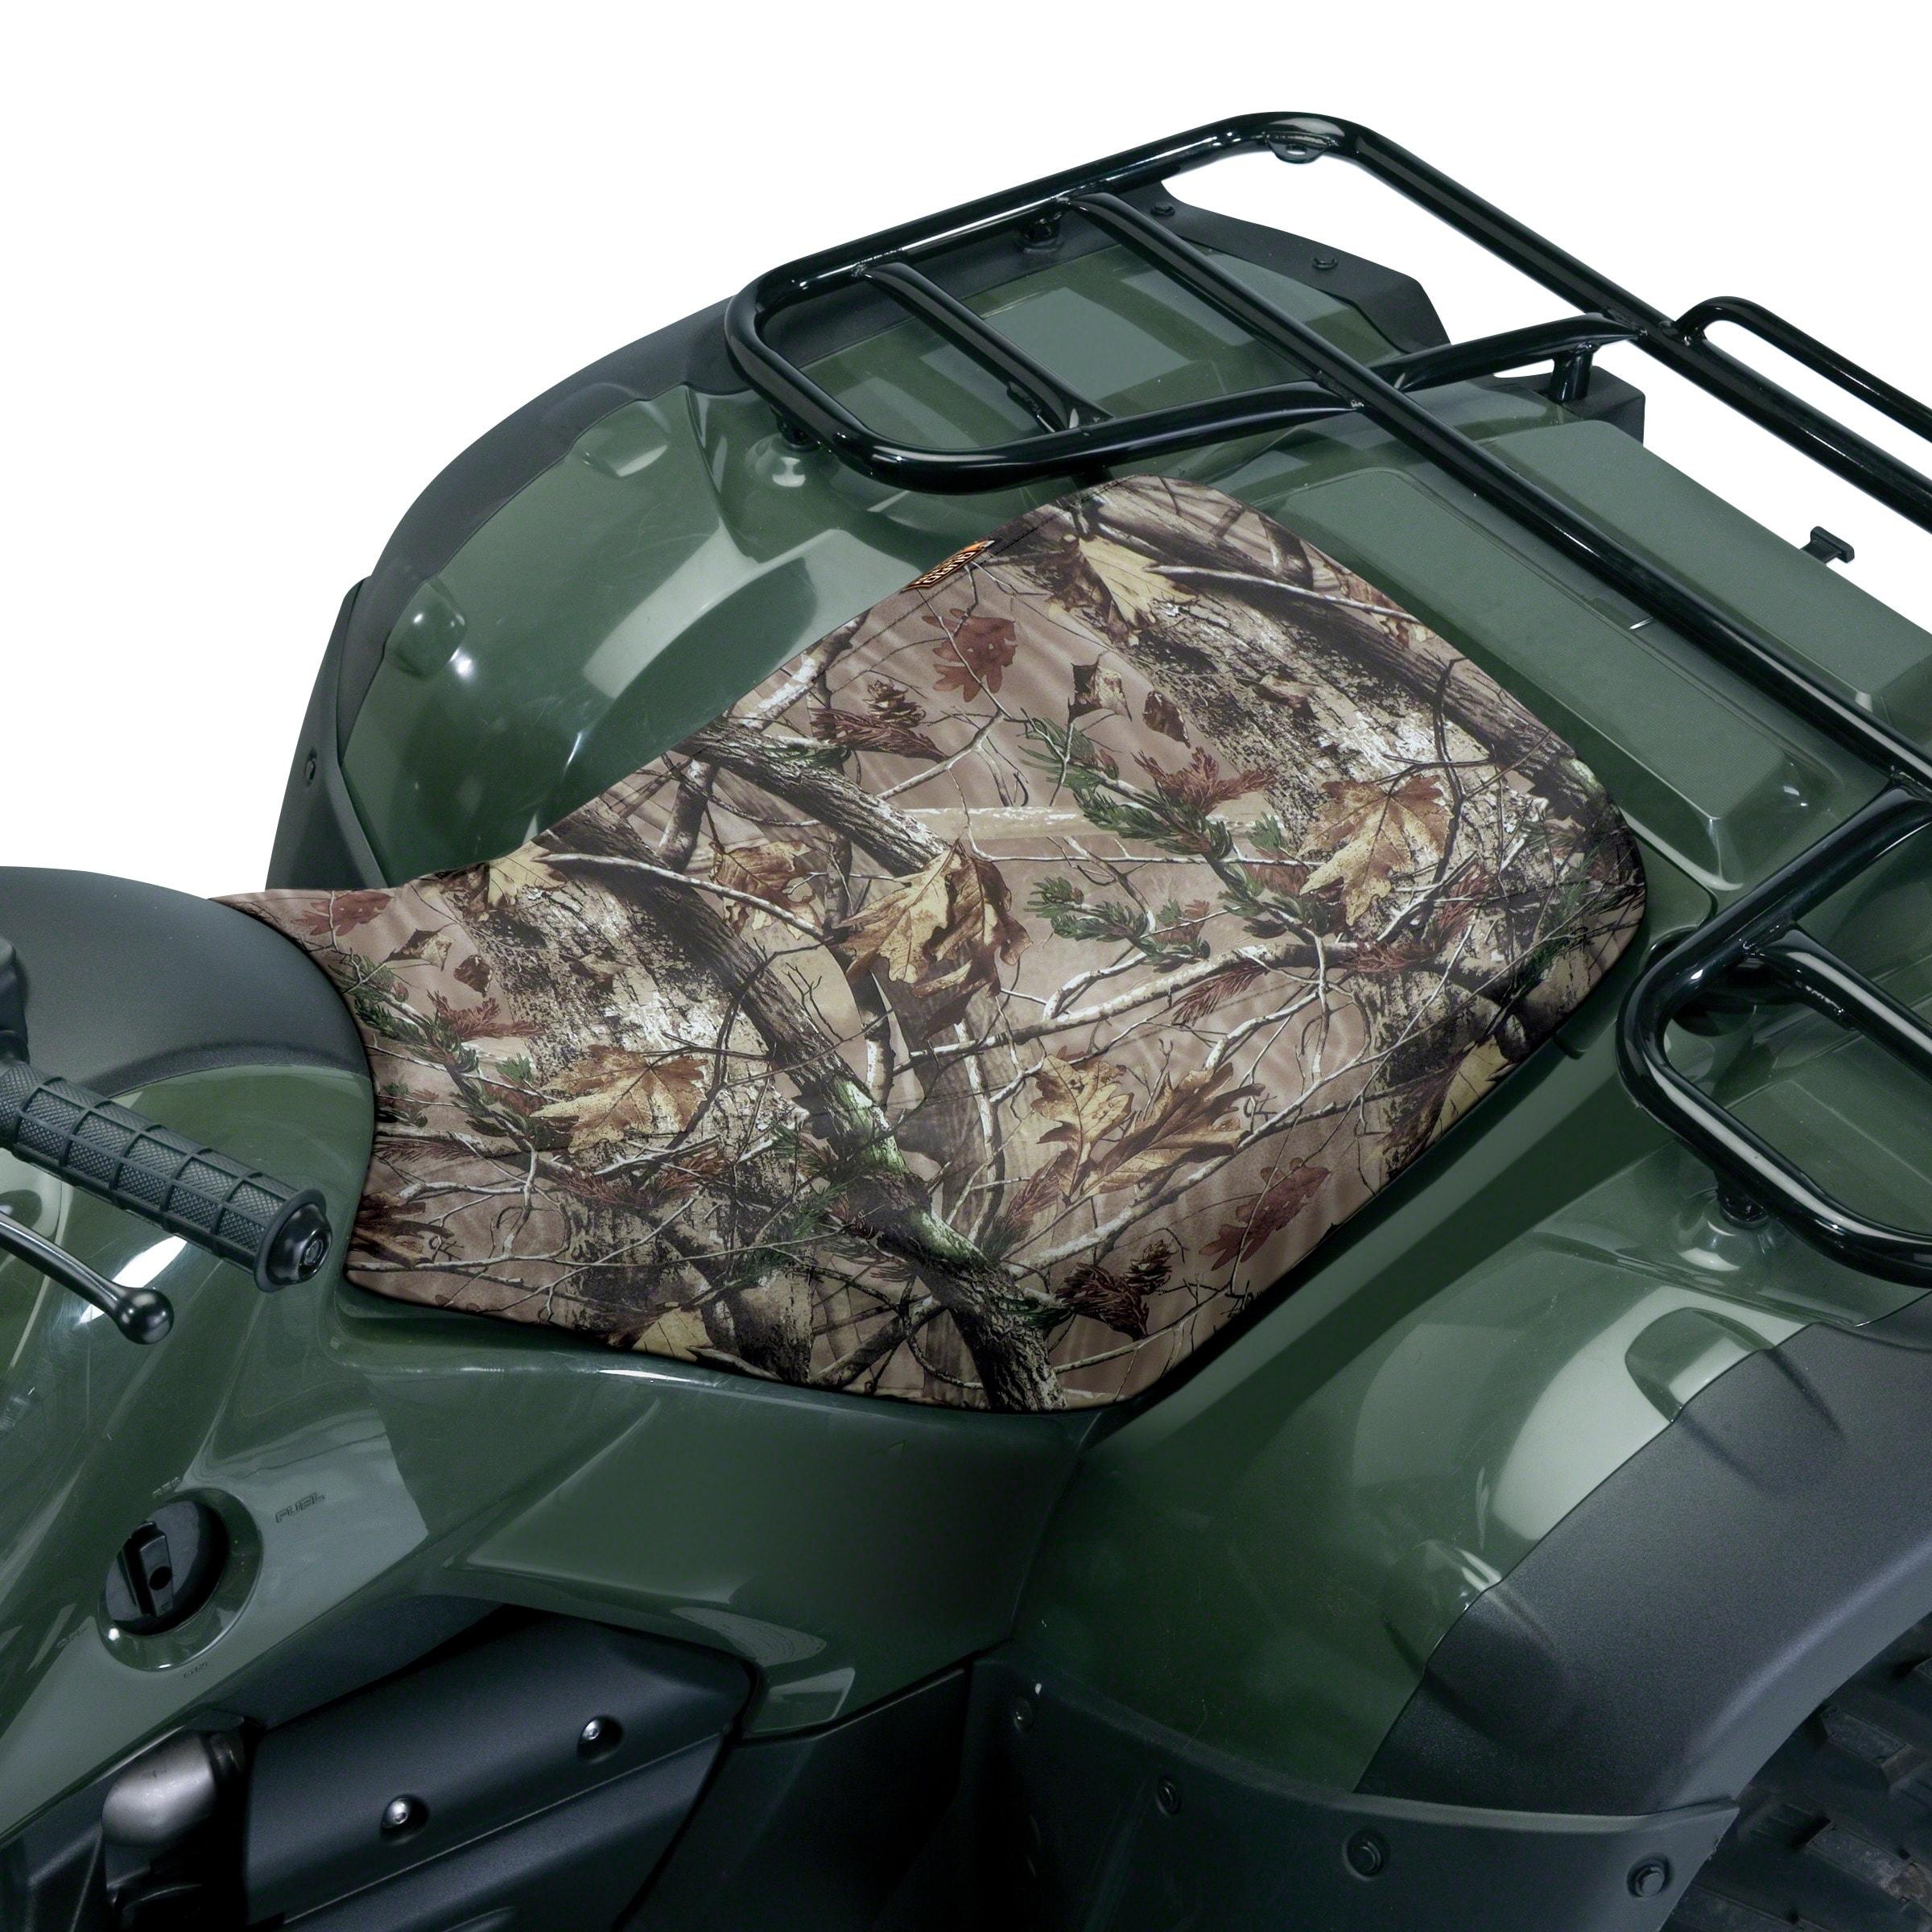 Classic 15-116-015901-00 ATV Seat Cover, Camo, Camouflage